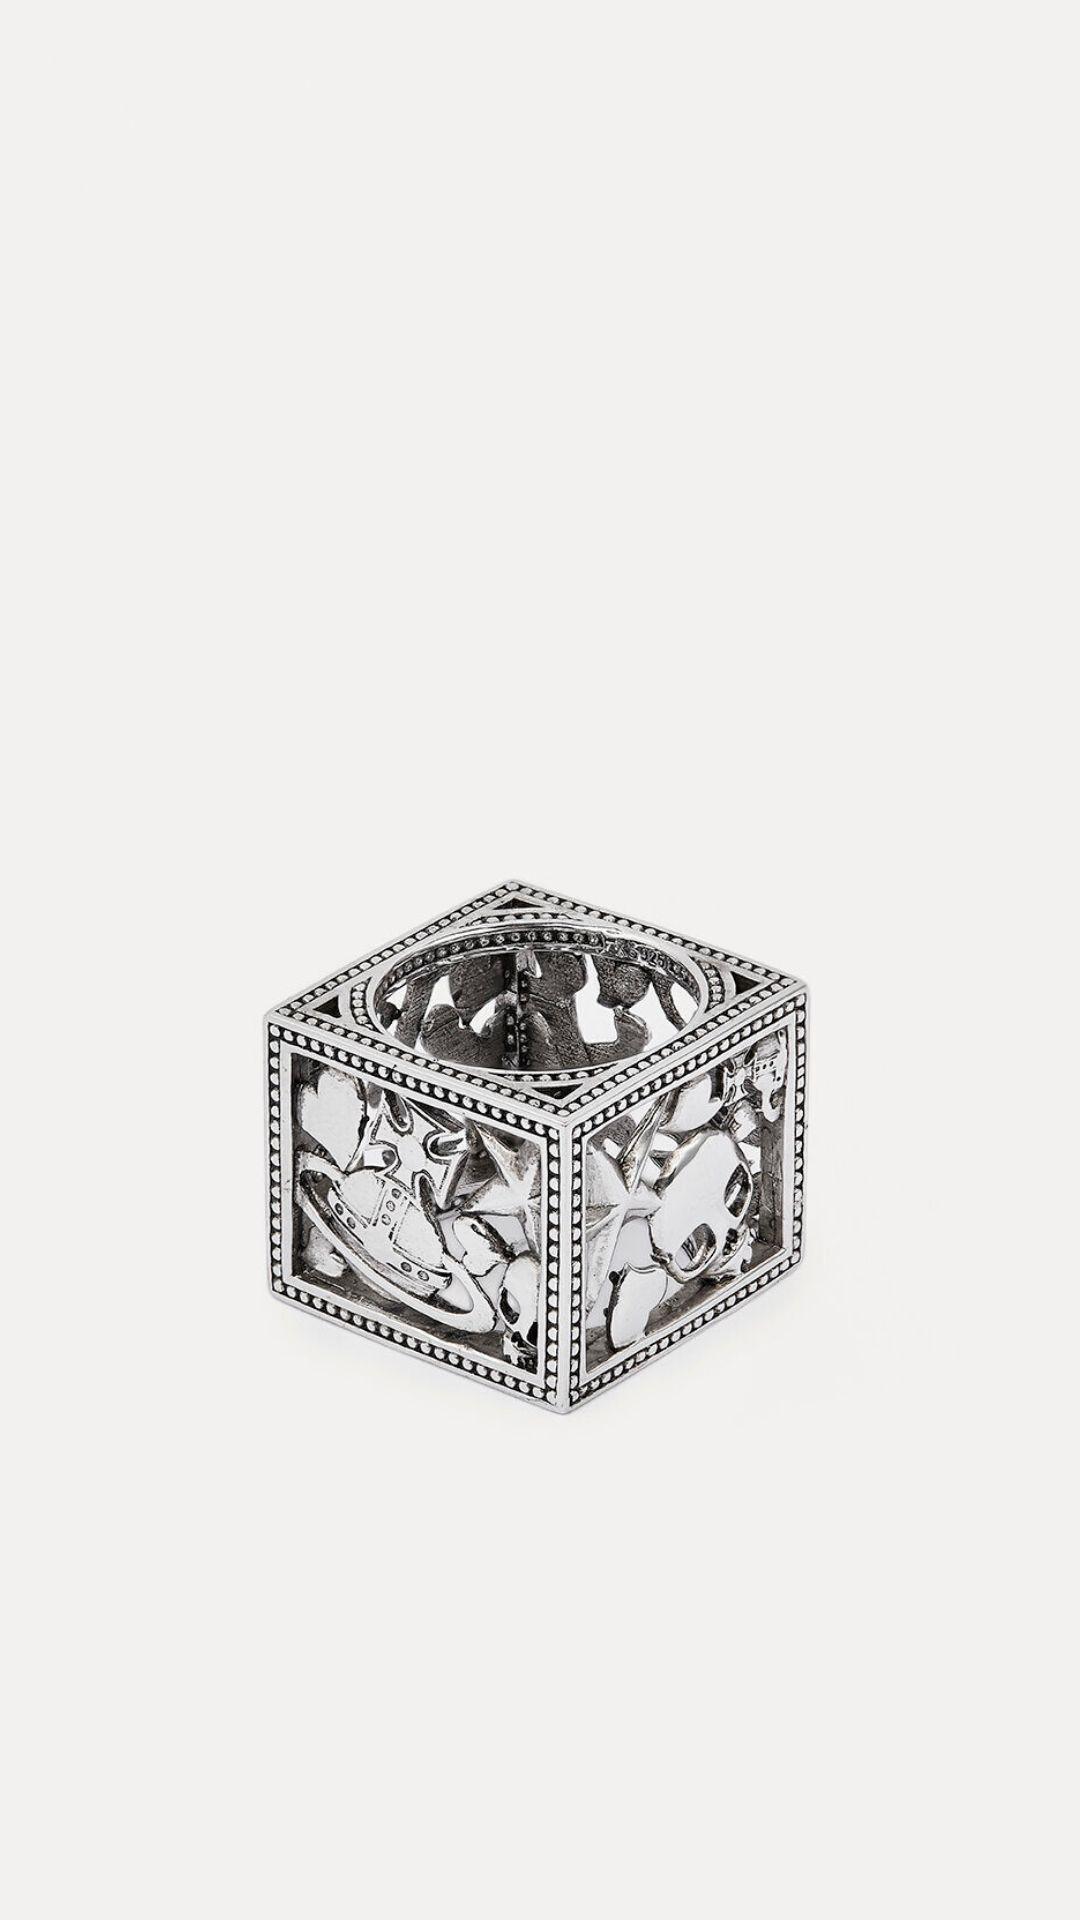 menswear, fashion, style, accessories, rings, esquire, 2020